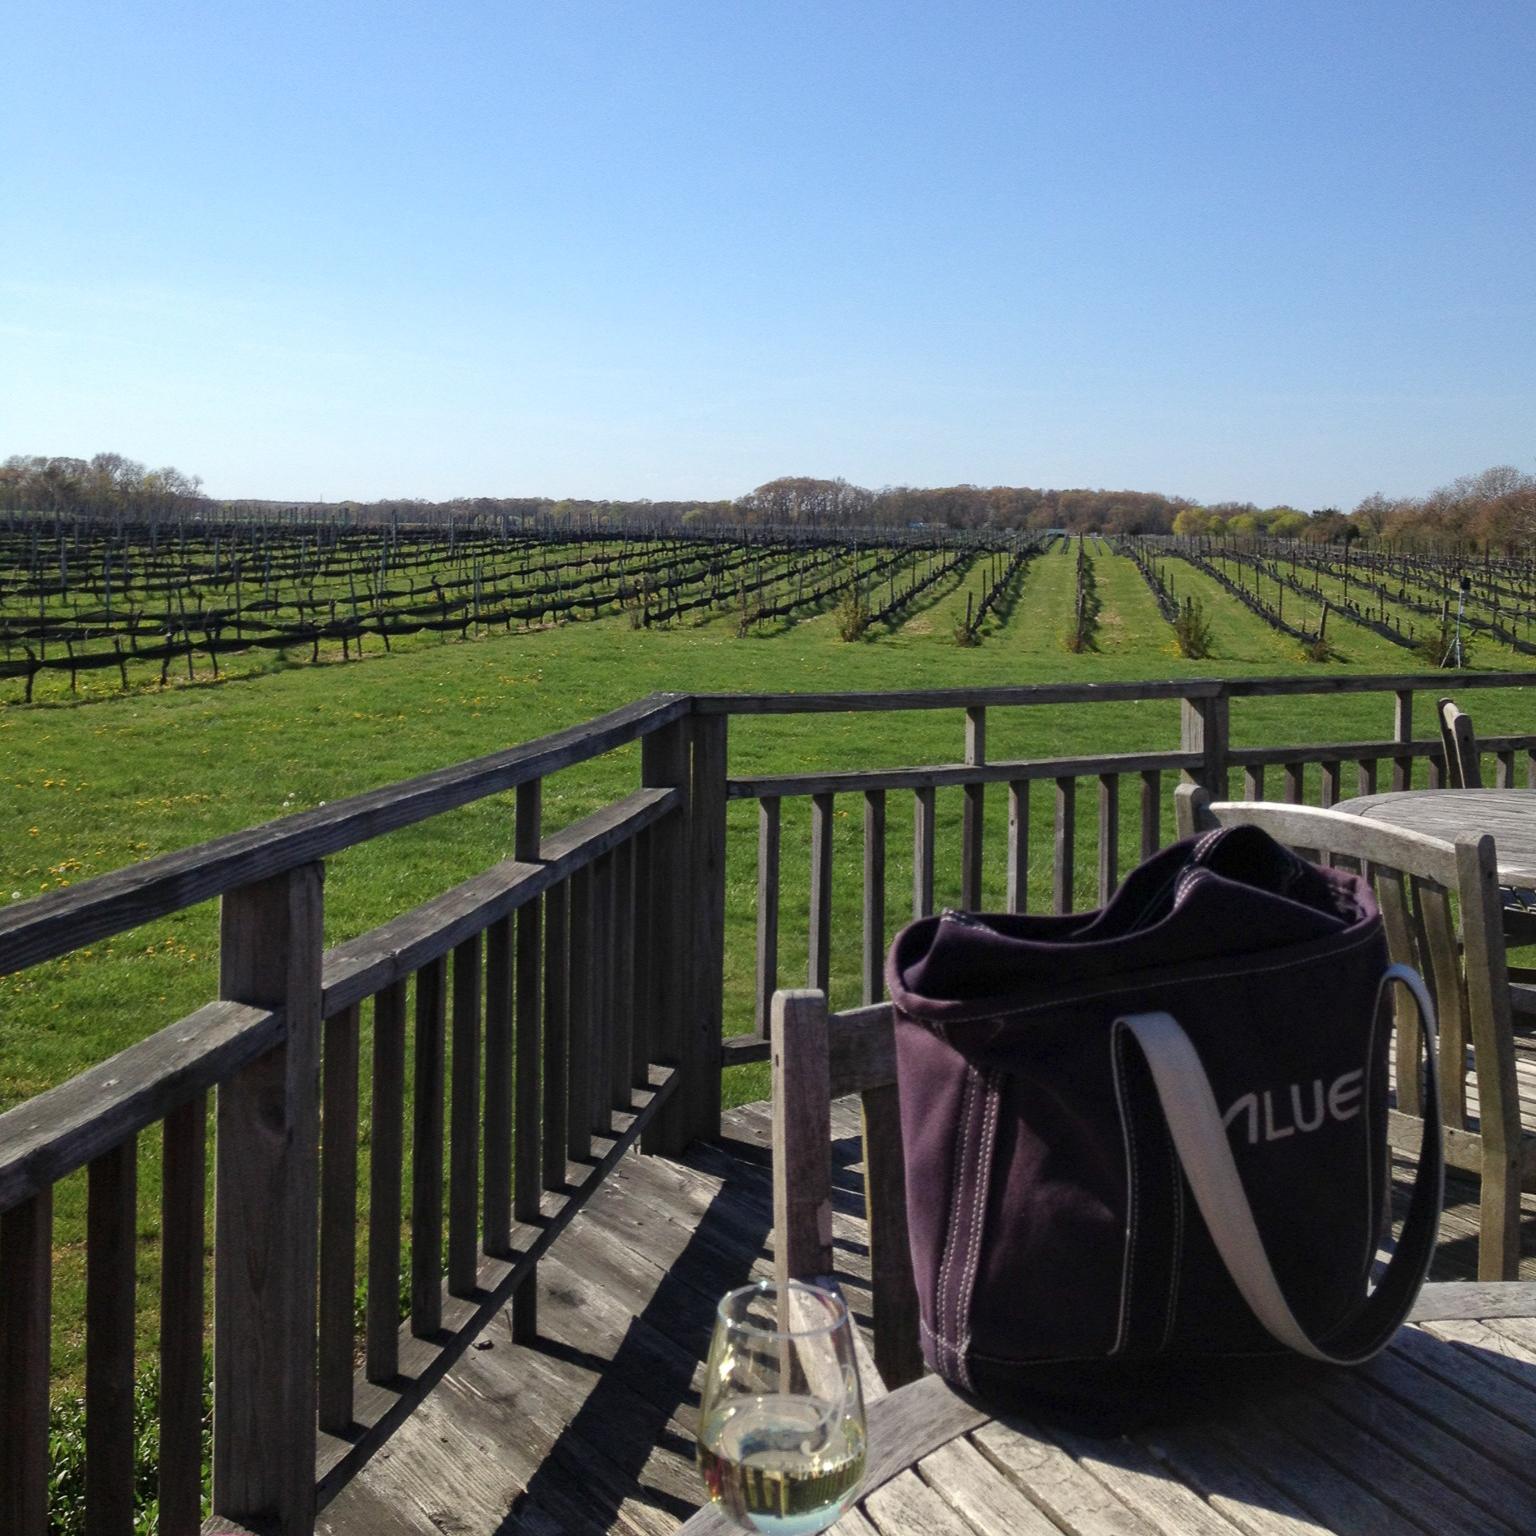 winery-alue-optics-tote-bag.jpg